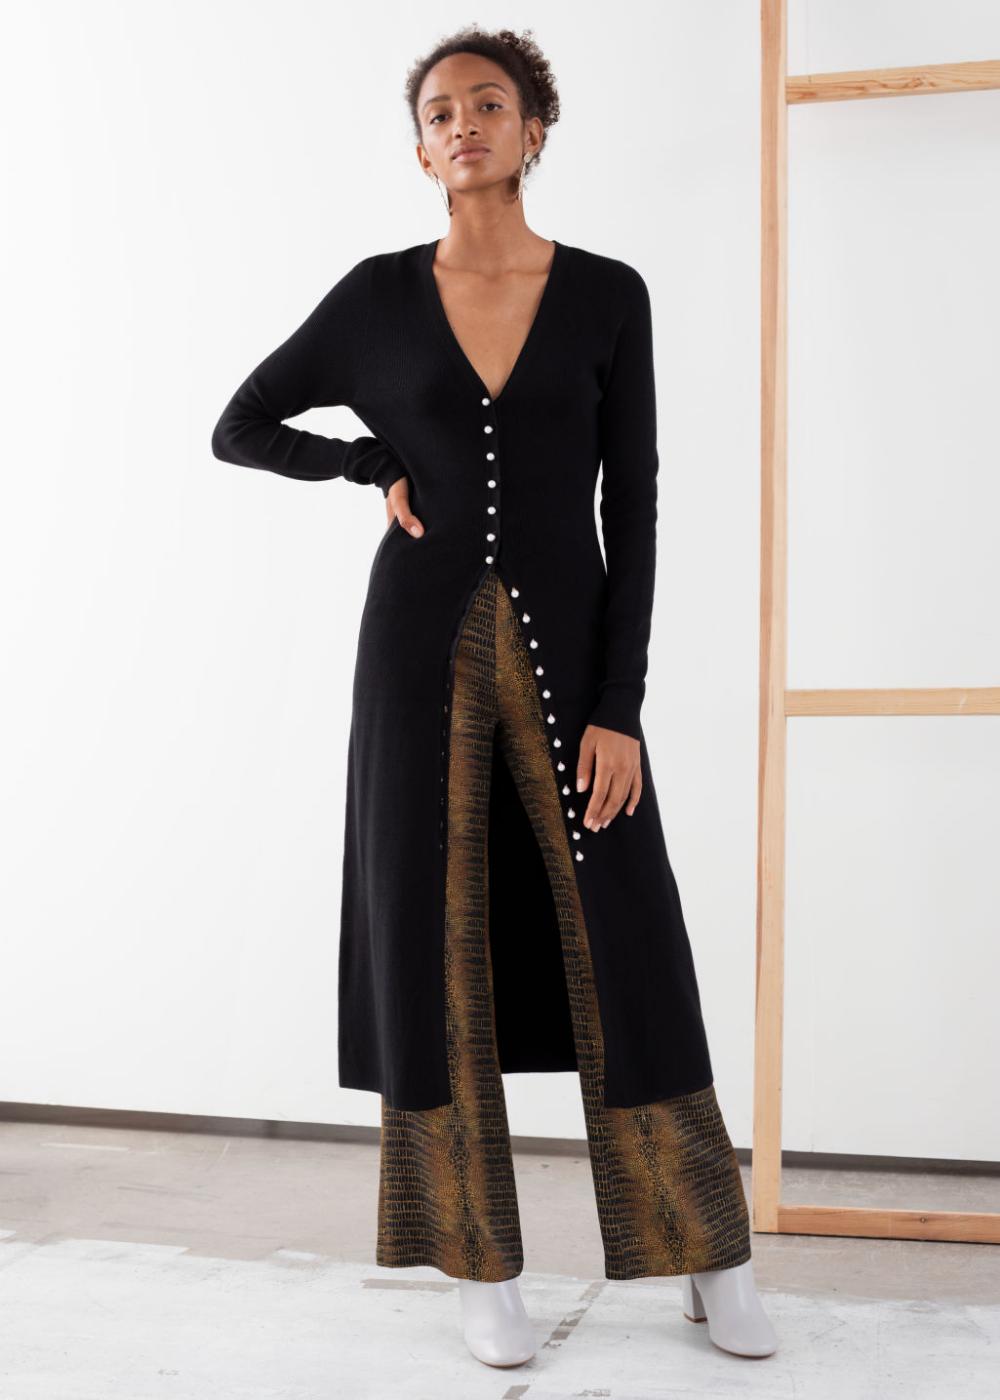 Ribbed Knit Button Up Midi Dress Midi Dress Midi Length Dress Fashion Clothes Women [ 1400 x 1000 Pixel ]